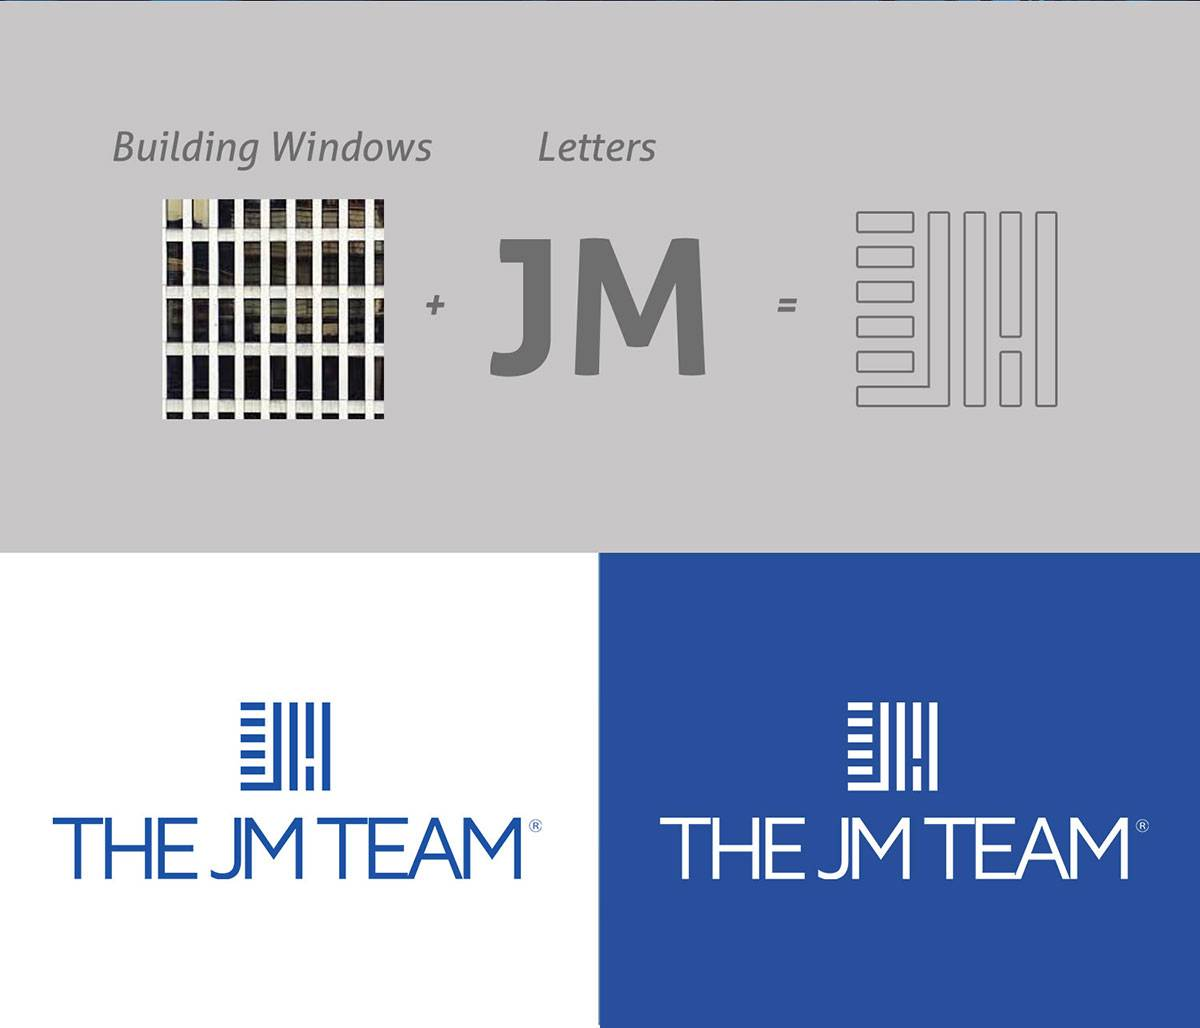 The JM Team